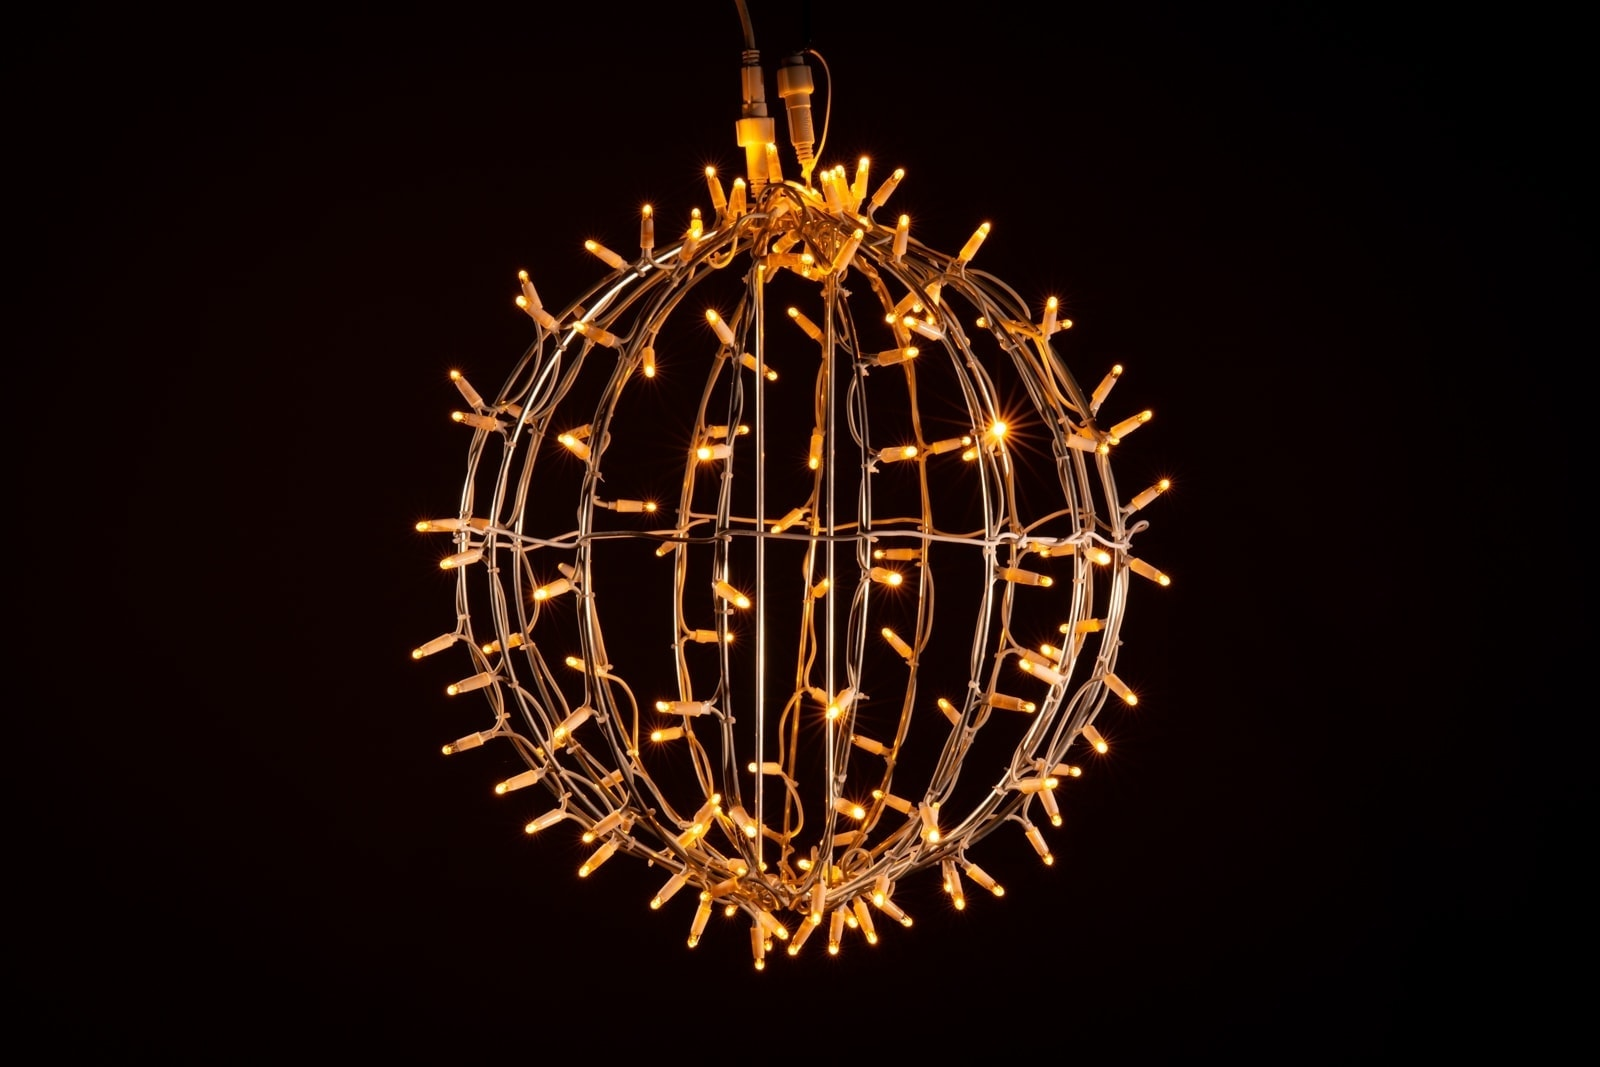 Kerstverlichting Bol Warm Wit O 50 Cm Koppelbaar 150 Lampjes